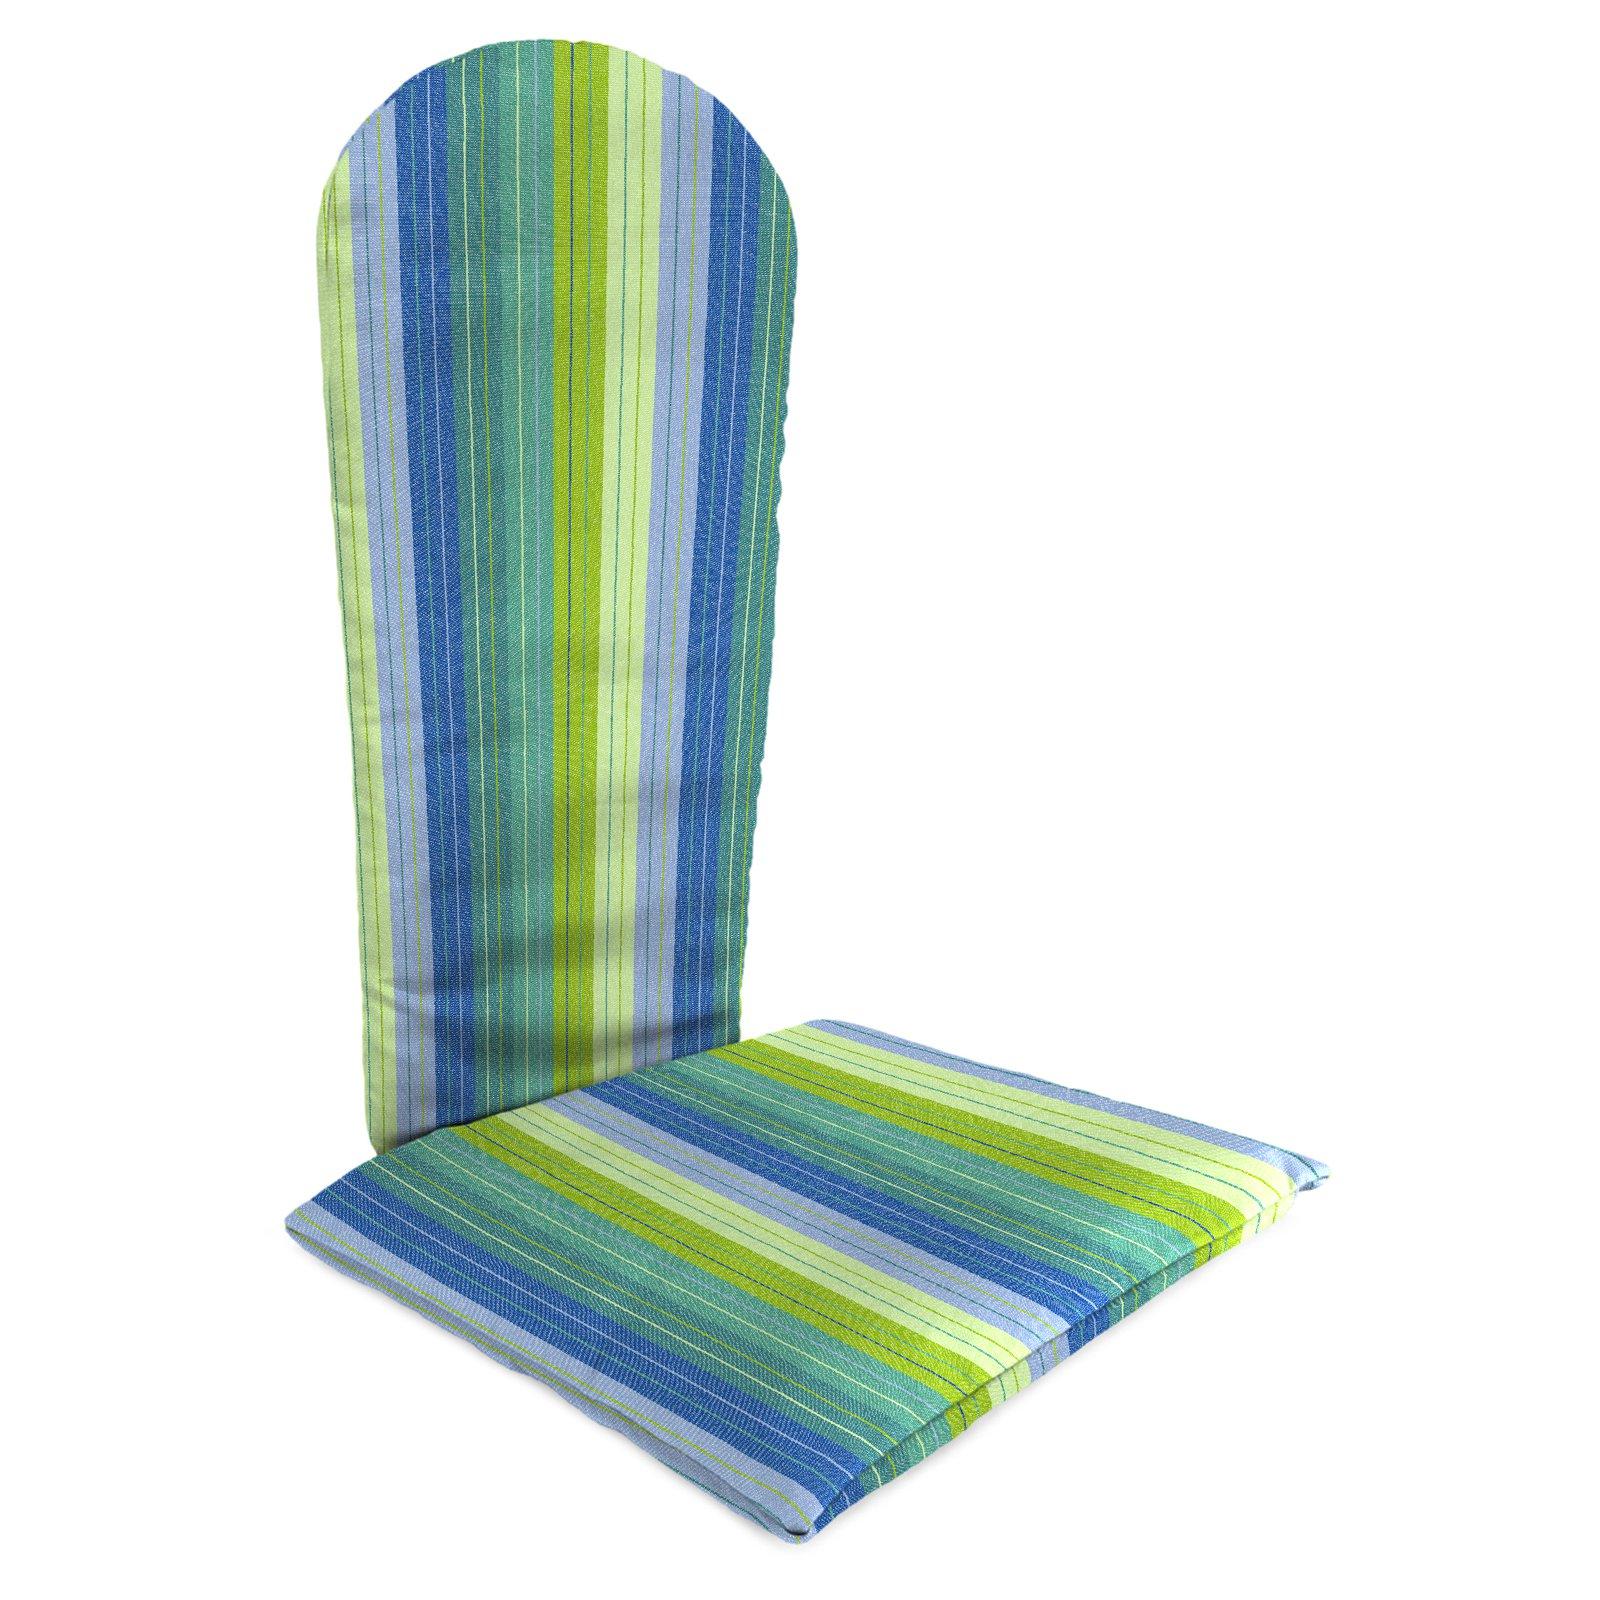 Jordan Manufacturing 49 x 20.5 Sunbrella Adirondack Chair Cushion